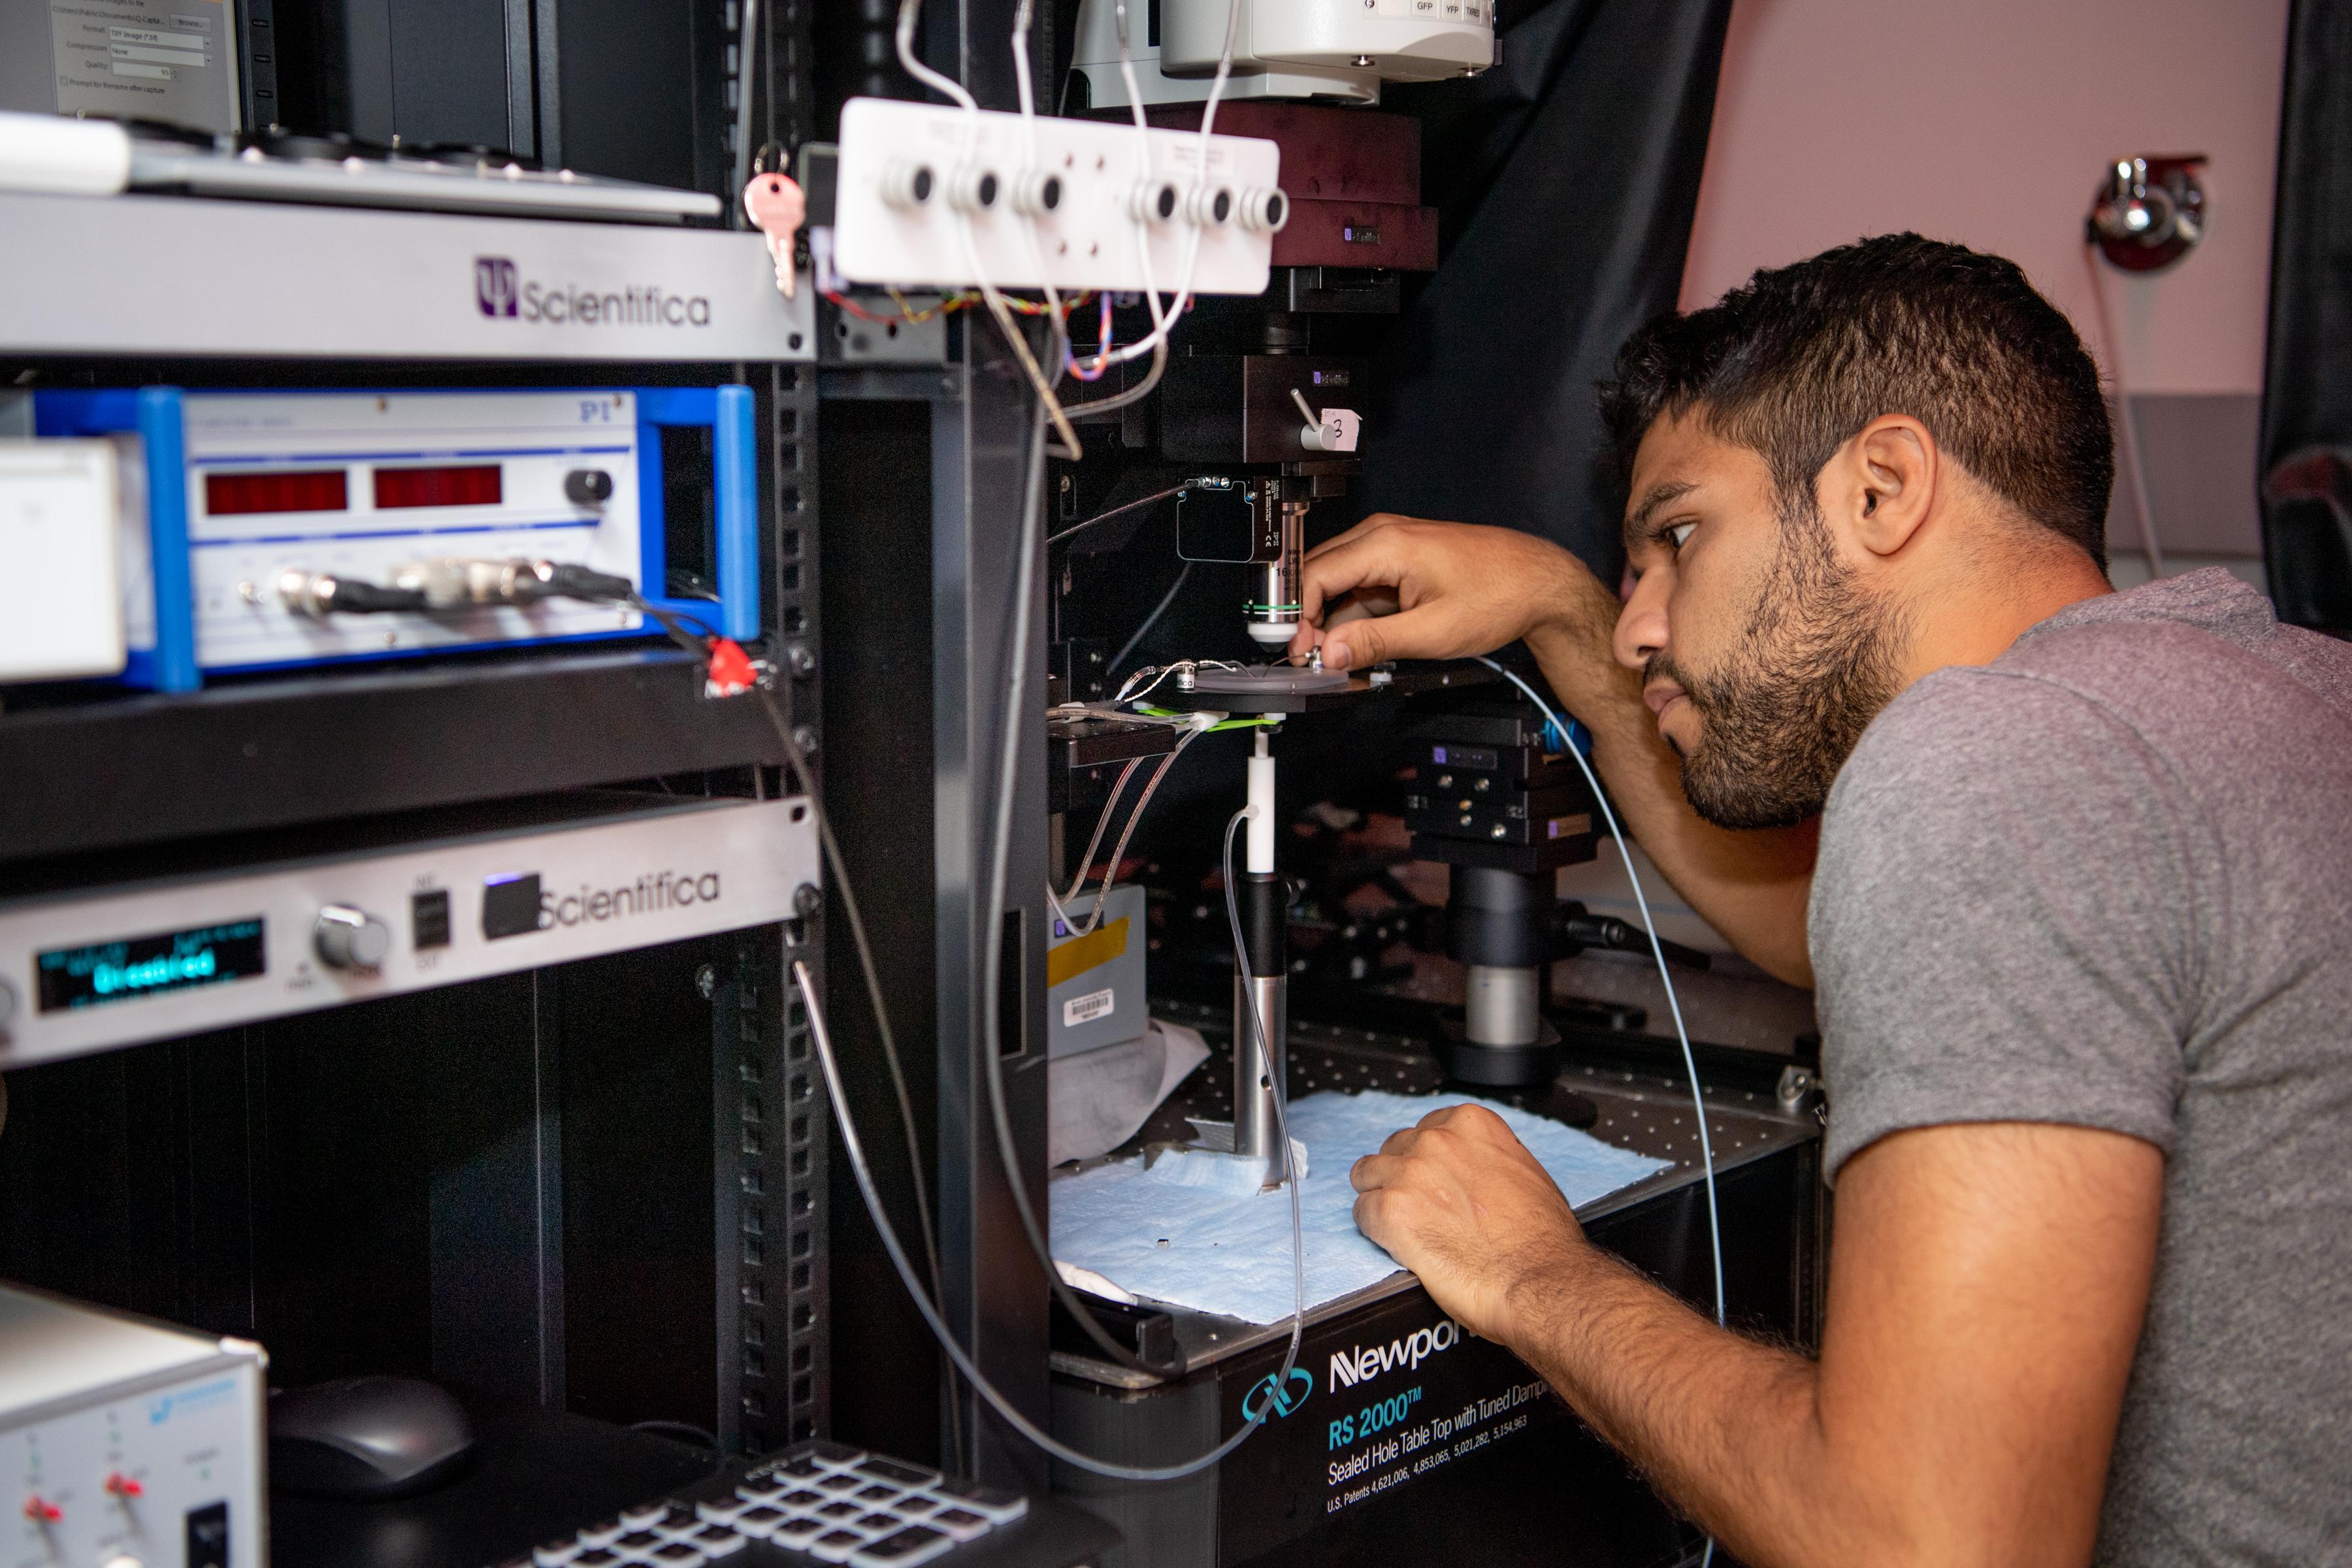 Apparatus for in vivo imaging in beh